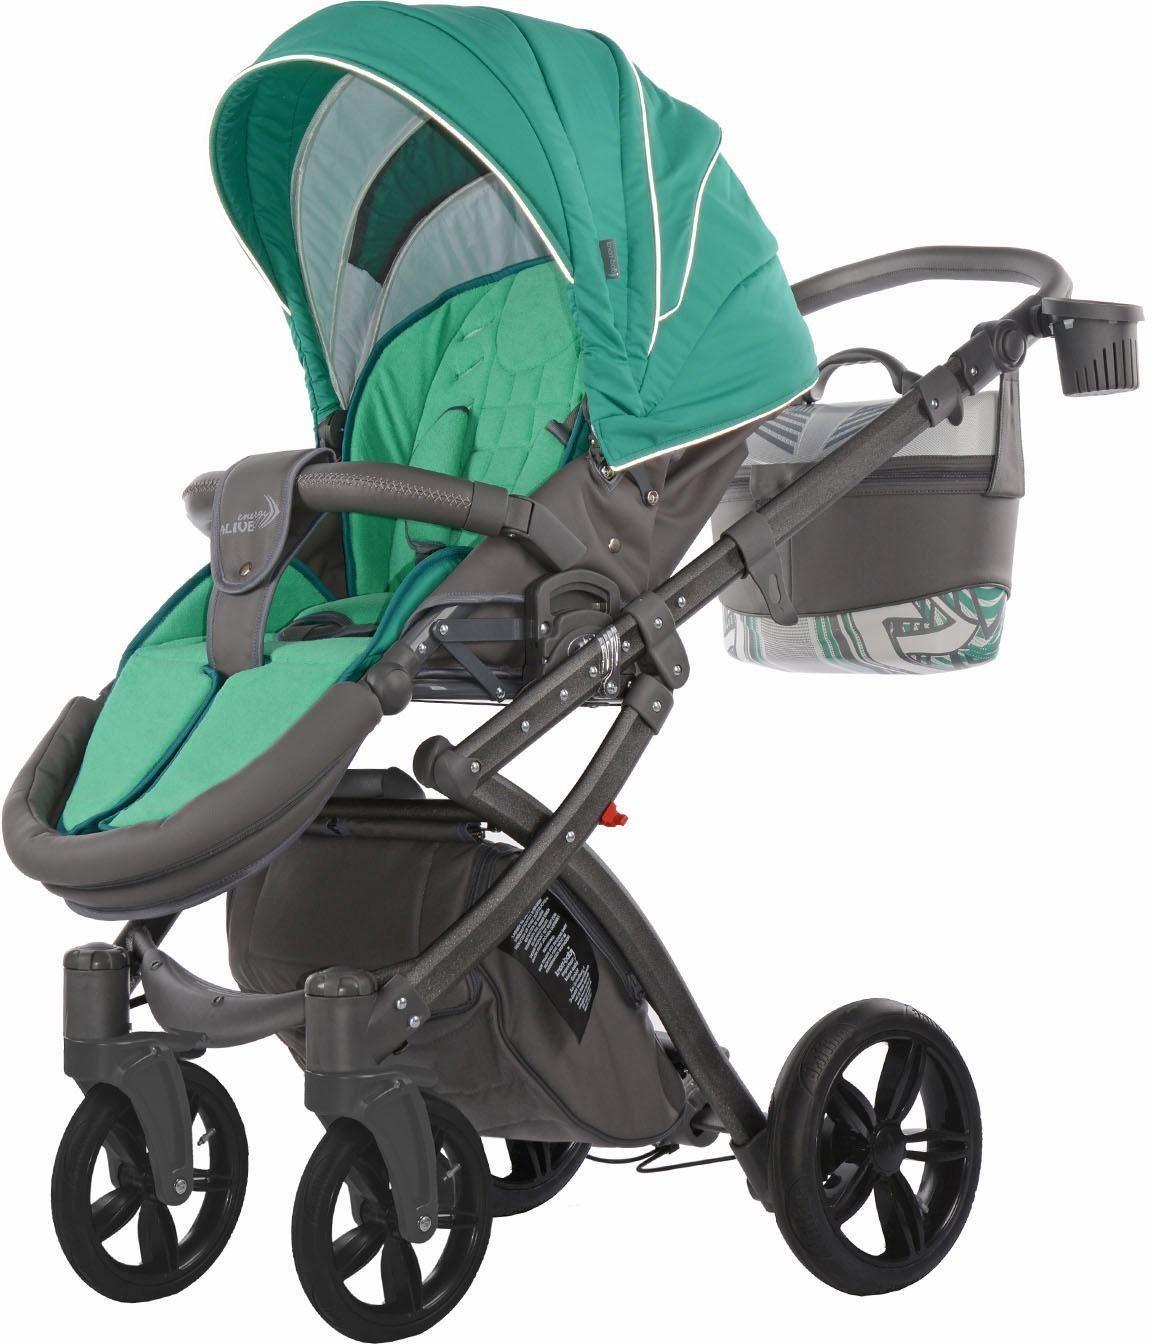 knorr-baby Kombi Kinderwagen, »Alive Energy, grün«